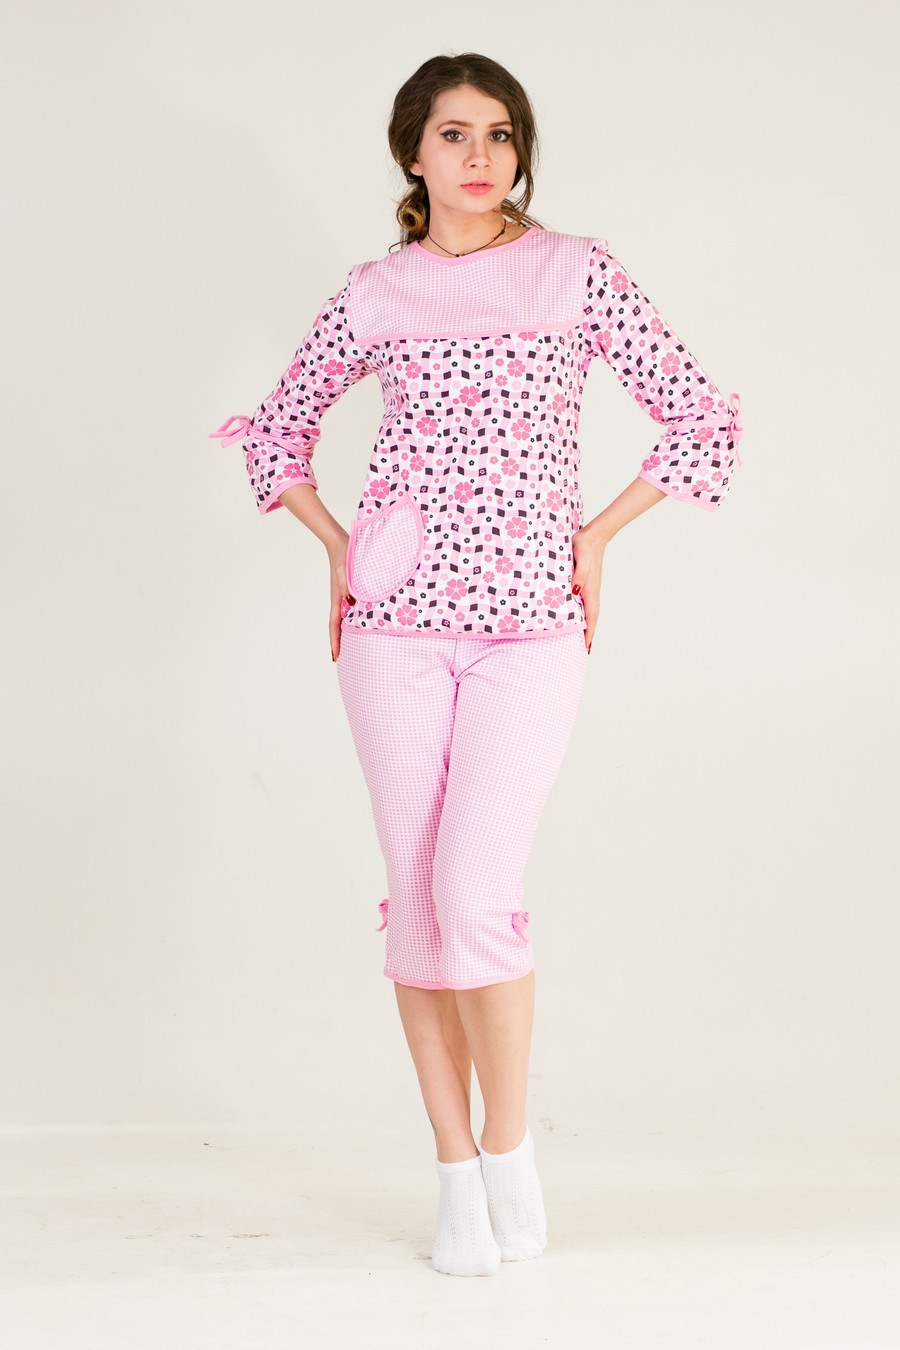 Пижама Катя Цветочки кофта +бриджиДомашняя одежда<br><br><br>Размер: 44